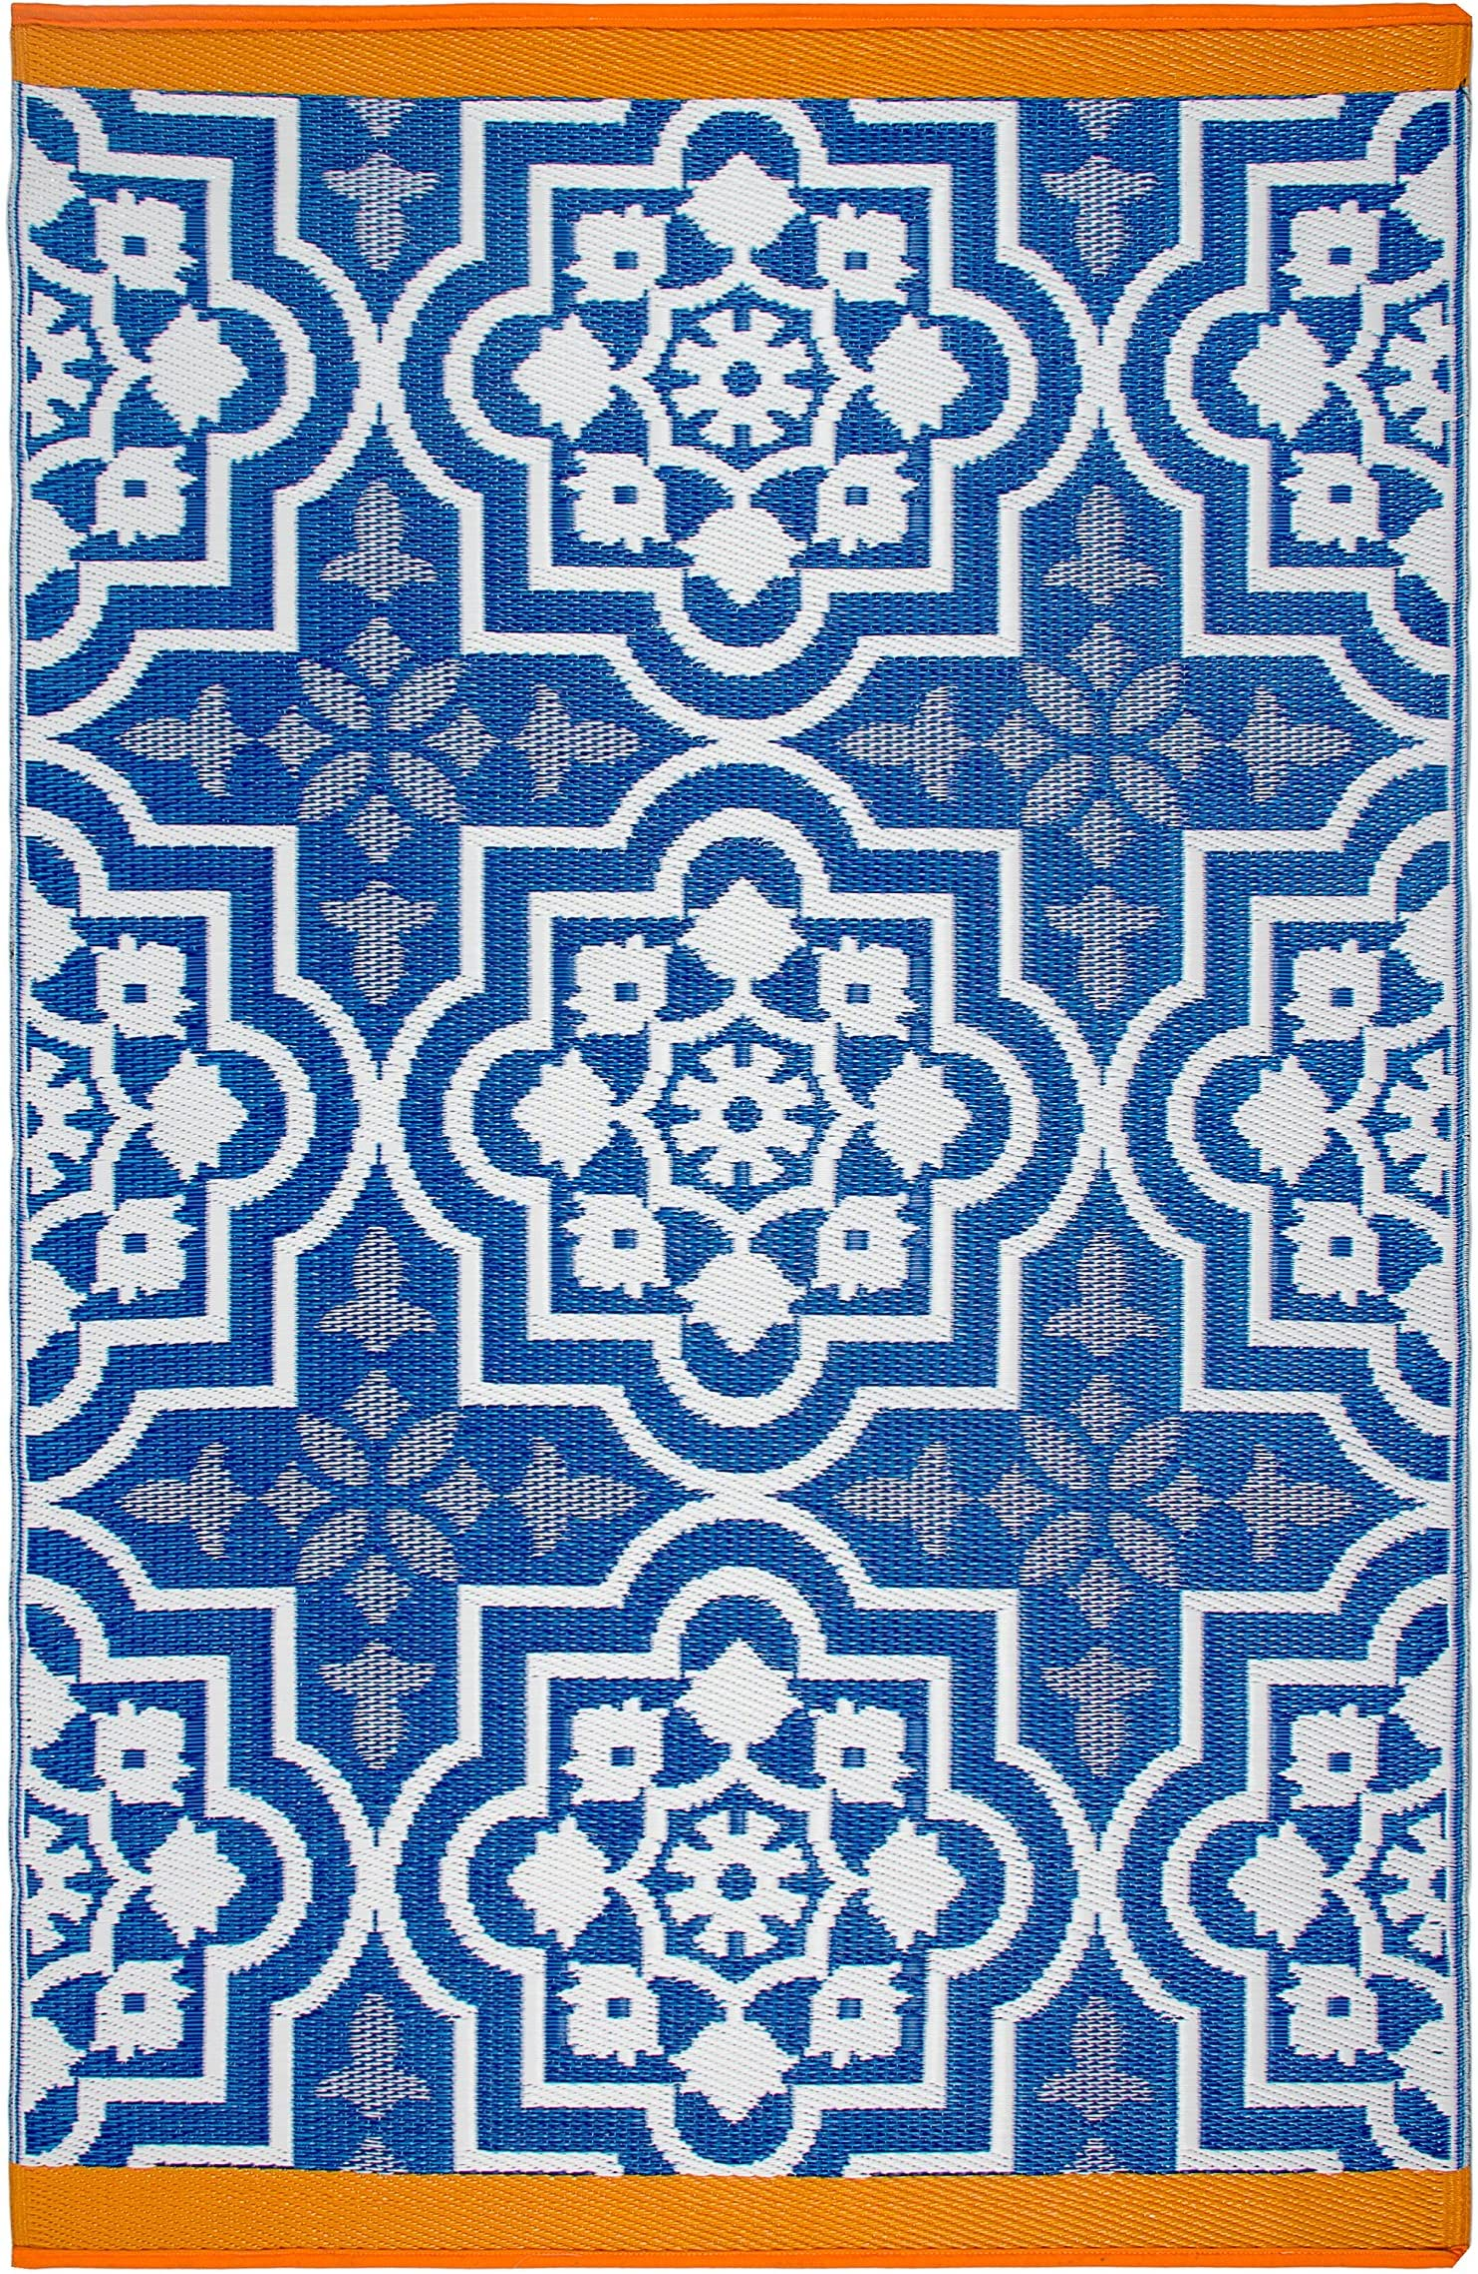 Fab Habitat Reversible Rugs | Indoor or Outdoor Use | Stain Resistant, Easy to Clean Weather Resistant Floor Mats | Puebla - Blue, 6' x 9'